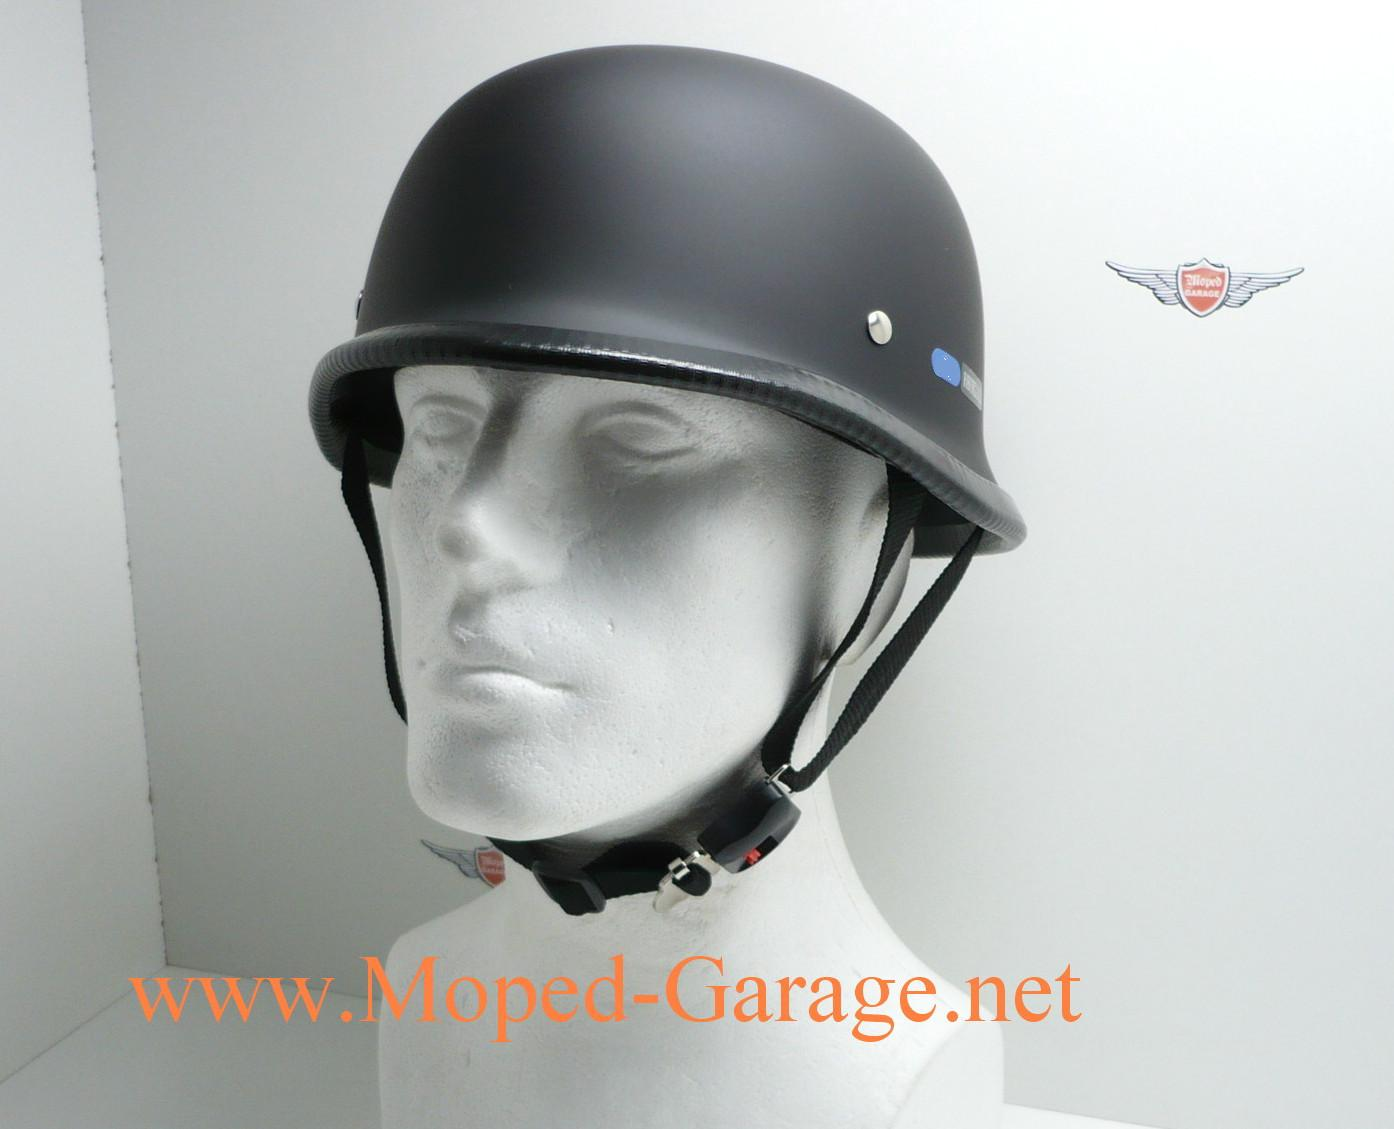 Moped Garage Net Motorrad Chopper Stahlhelm Halbschalen